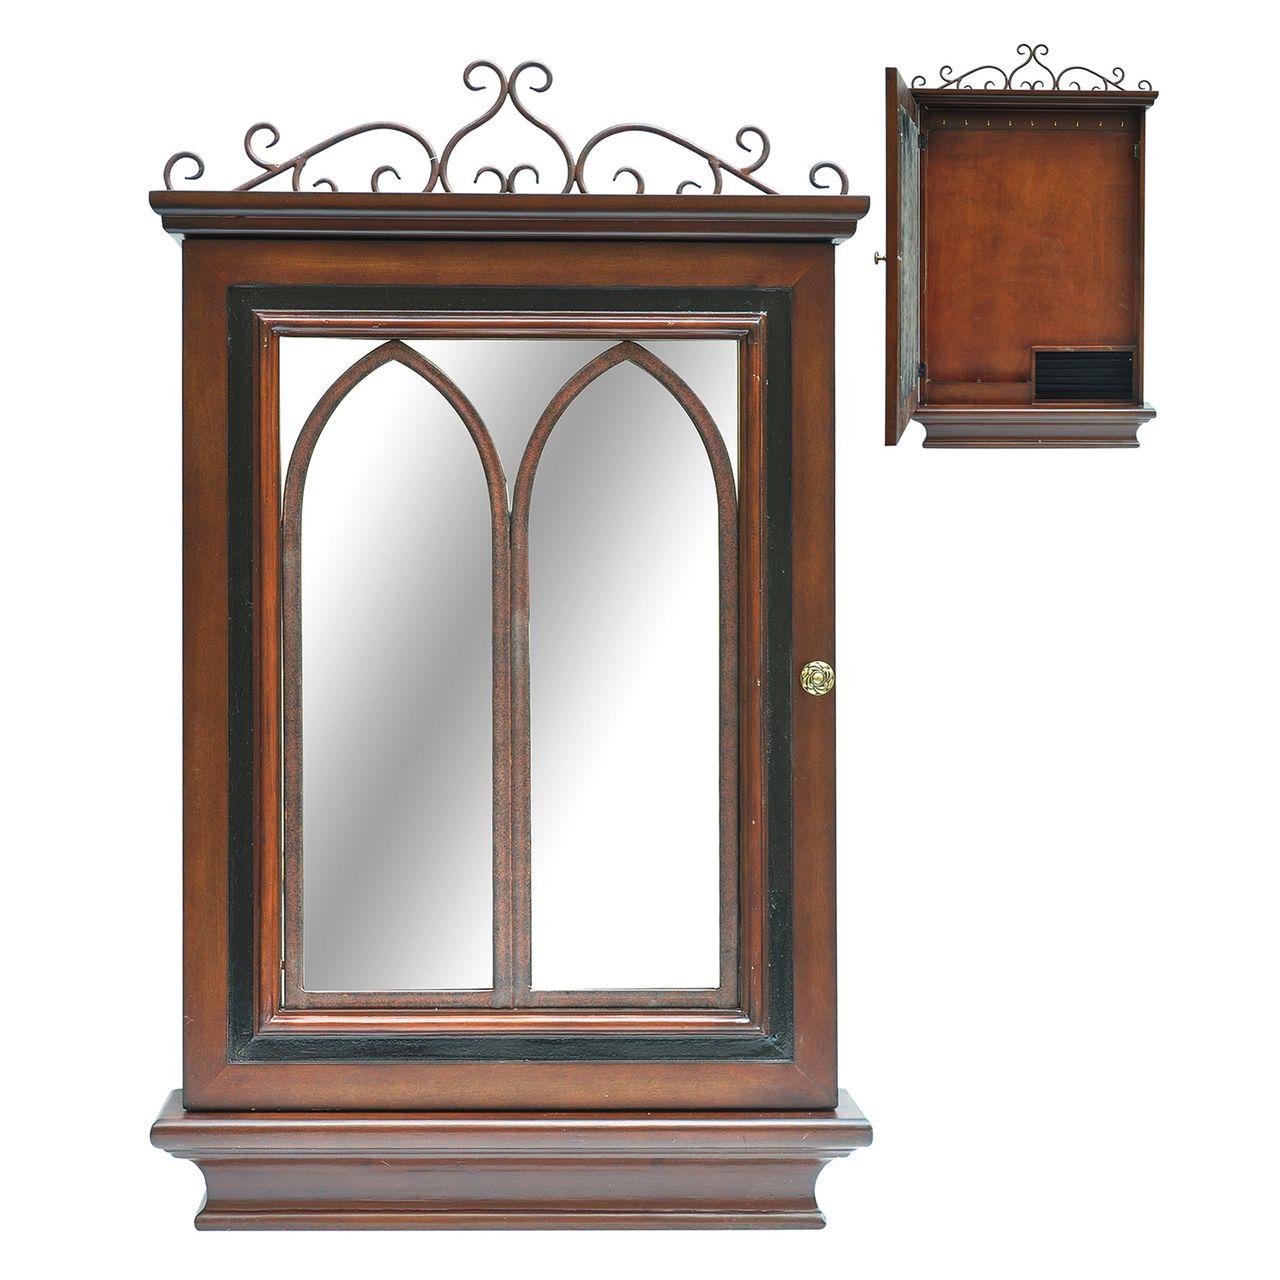 Past Reflected Hidden Key Hook Cabinet Wall Mirror 36 X 21 1/2 - Zeckos